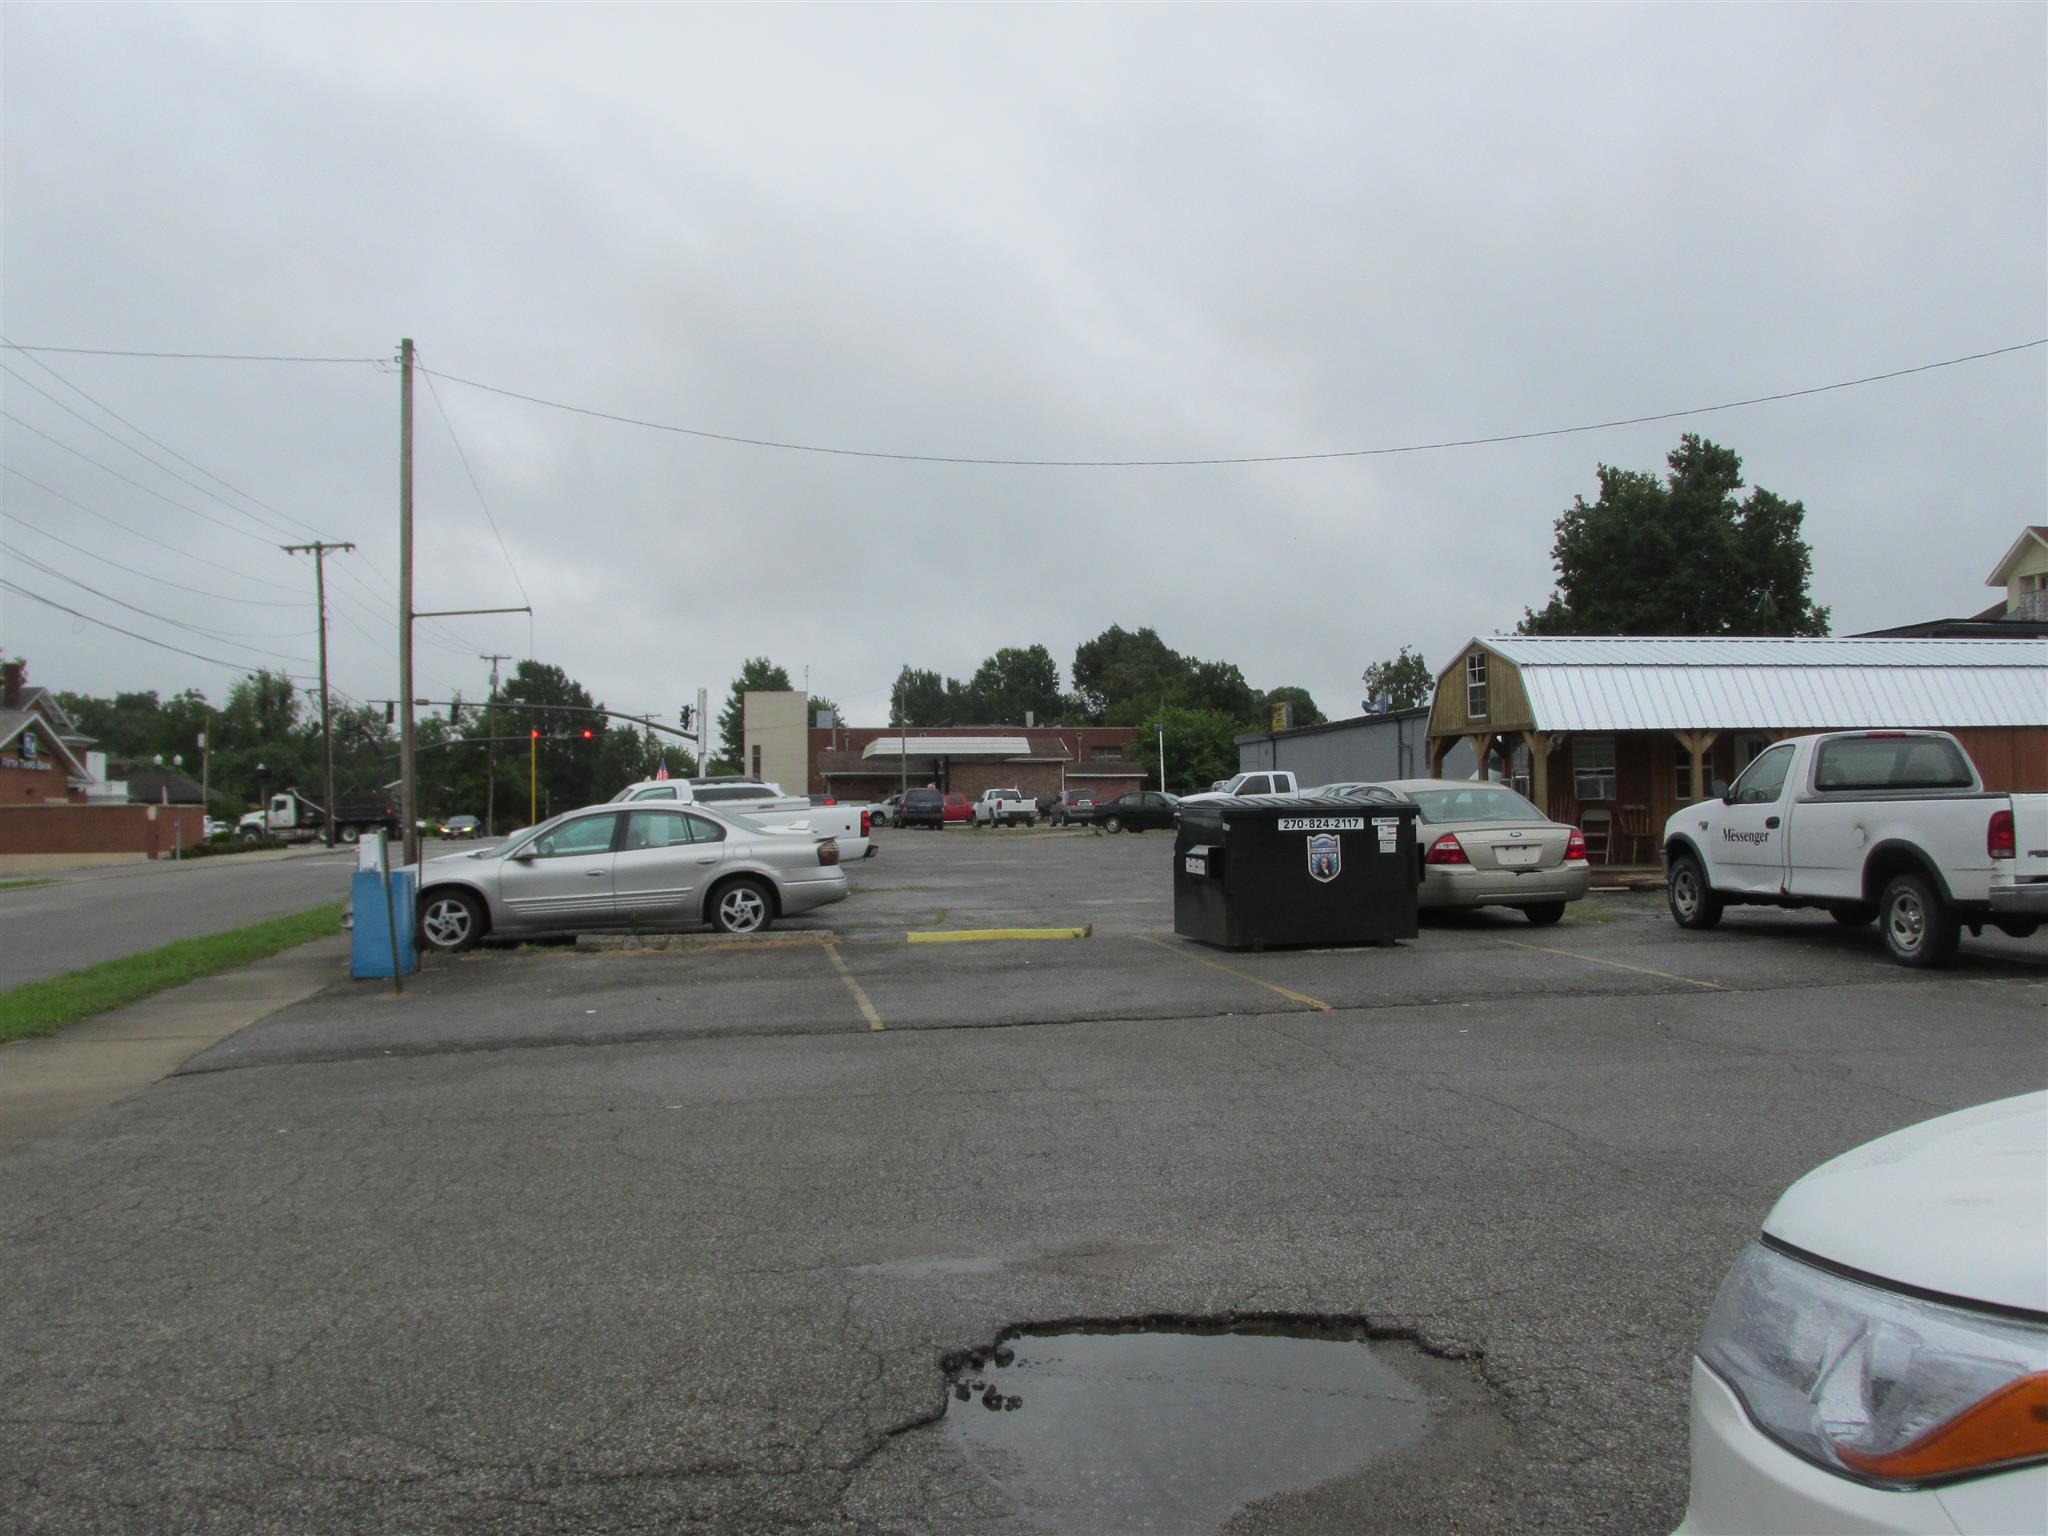 207 S Main St, Madisonville, KY 42431